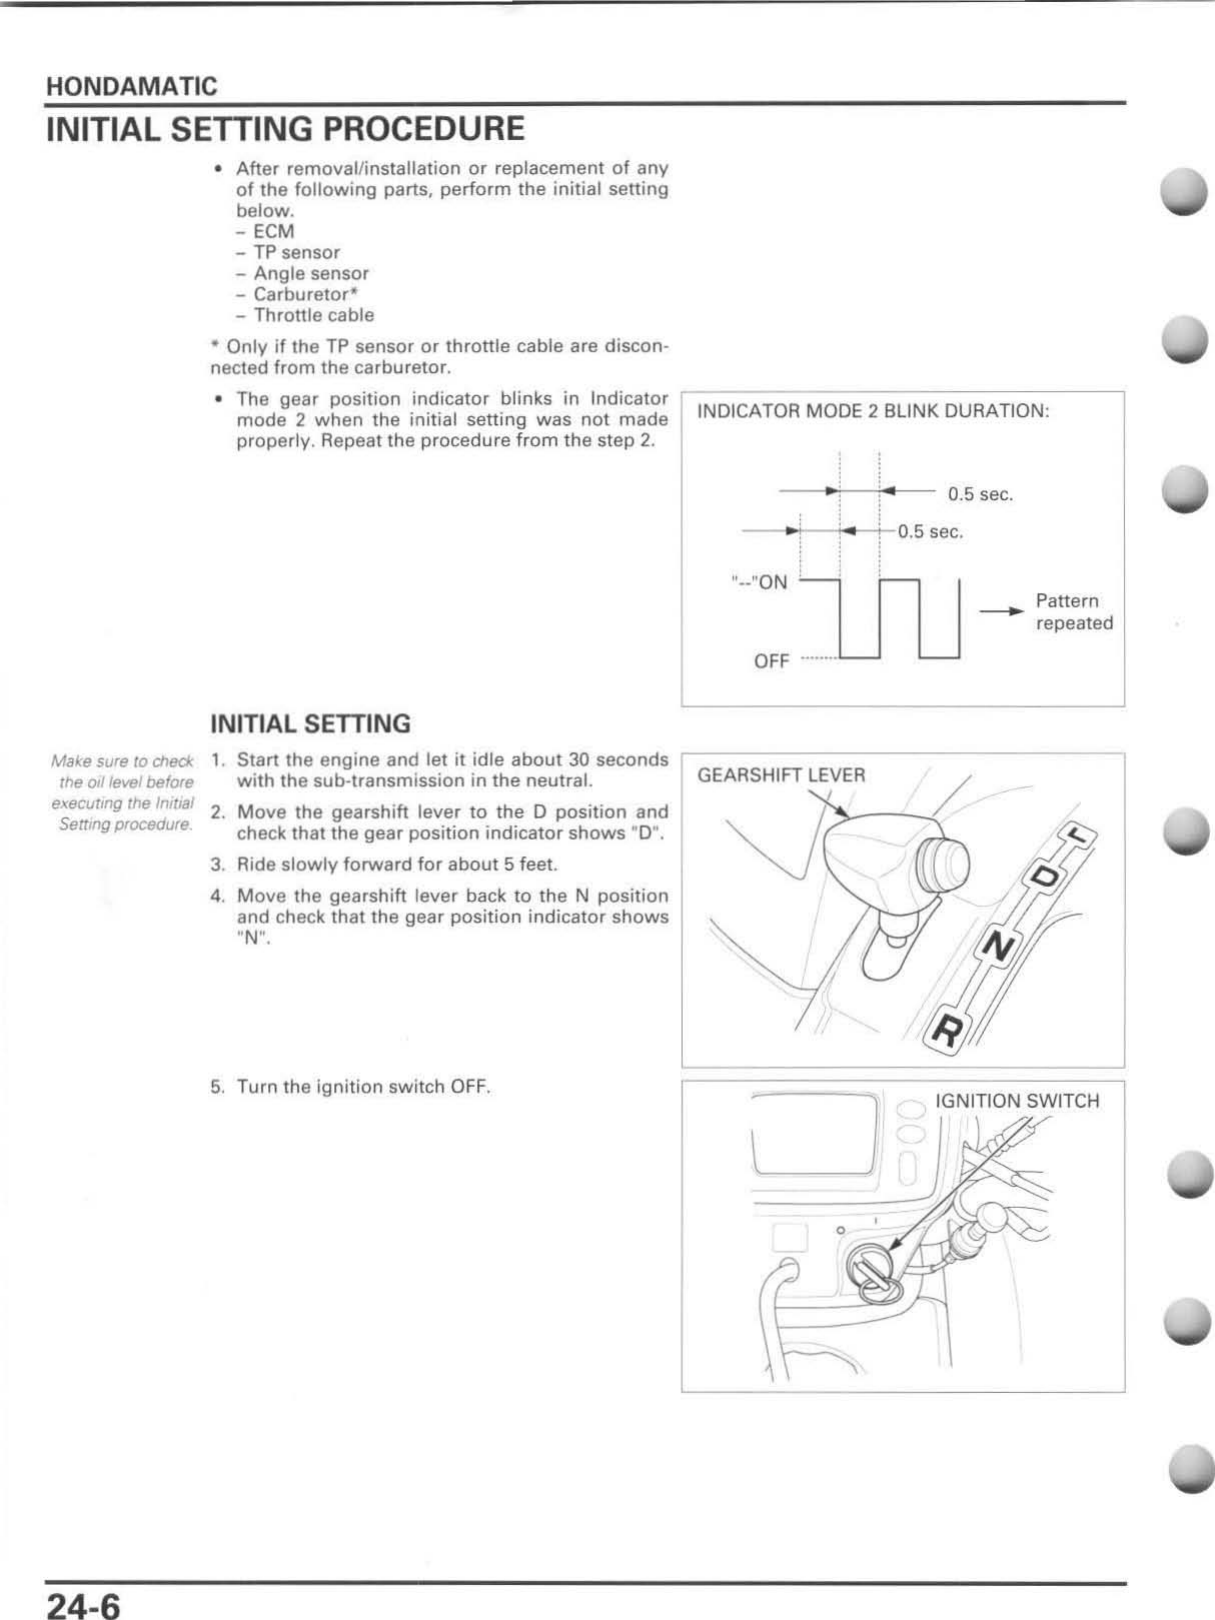 Honda Foreman Rubicon Service Manual 2005 2012 [2005 2012